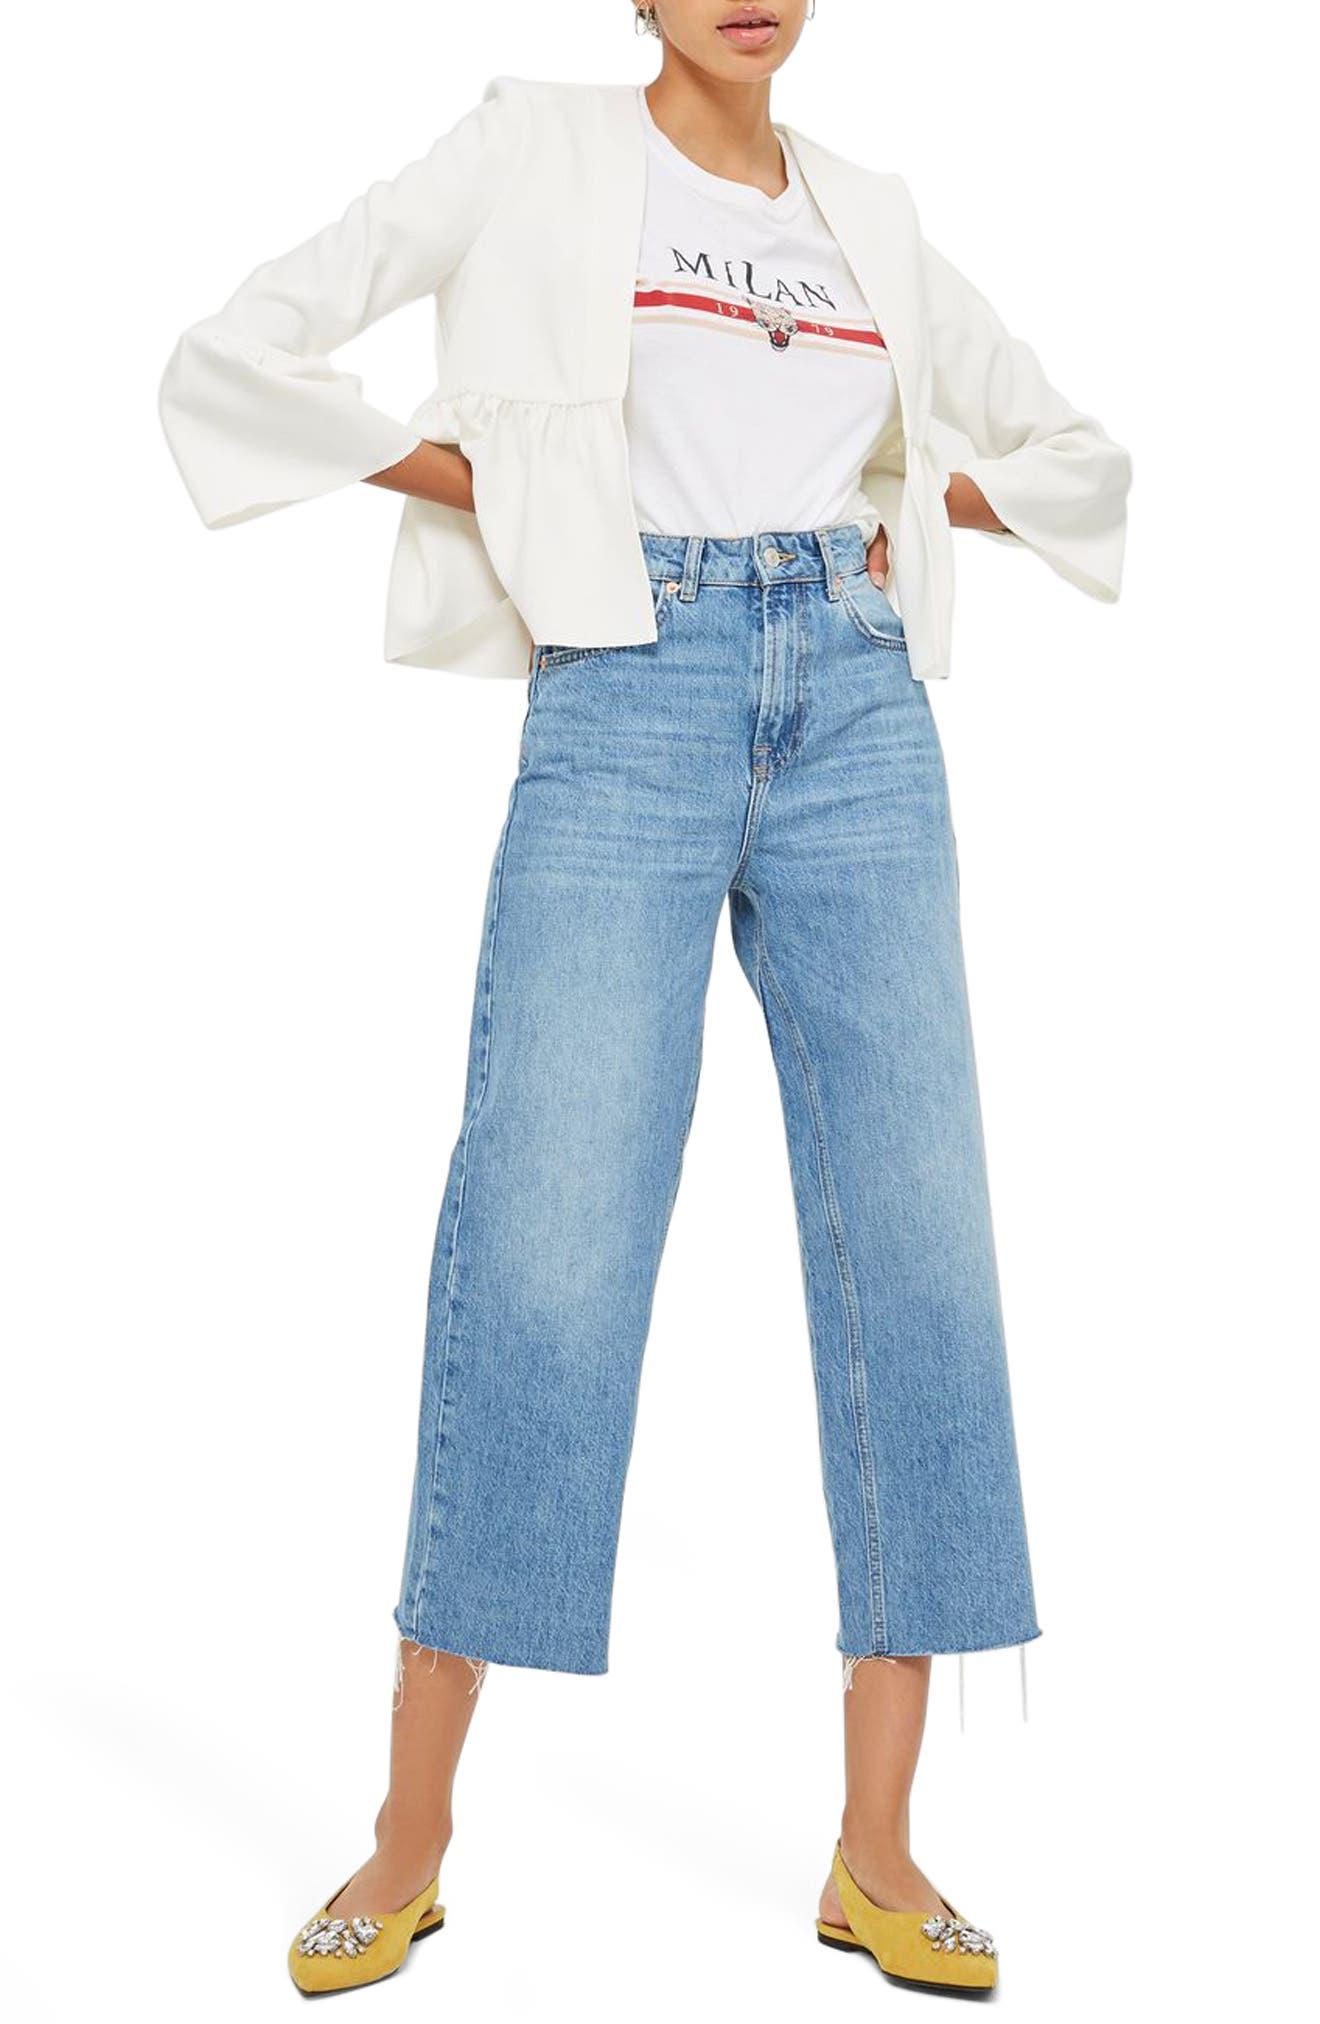 Topshop Ruffle Crop Jacket (Petite)